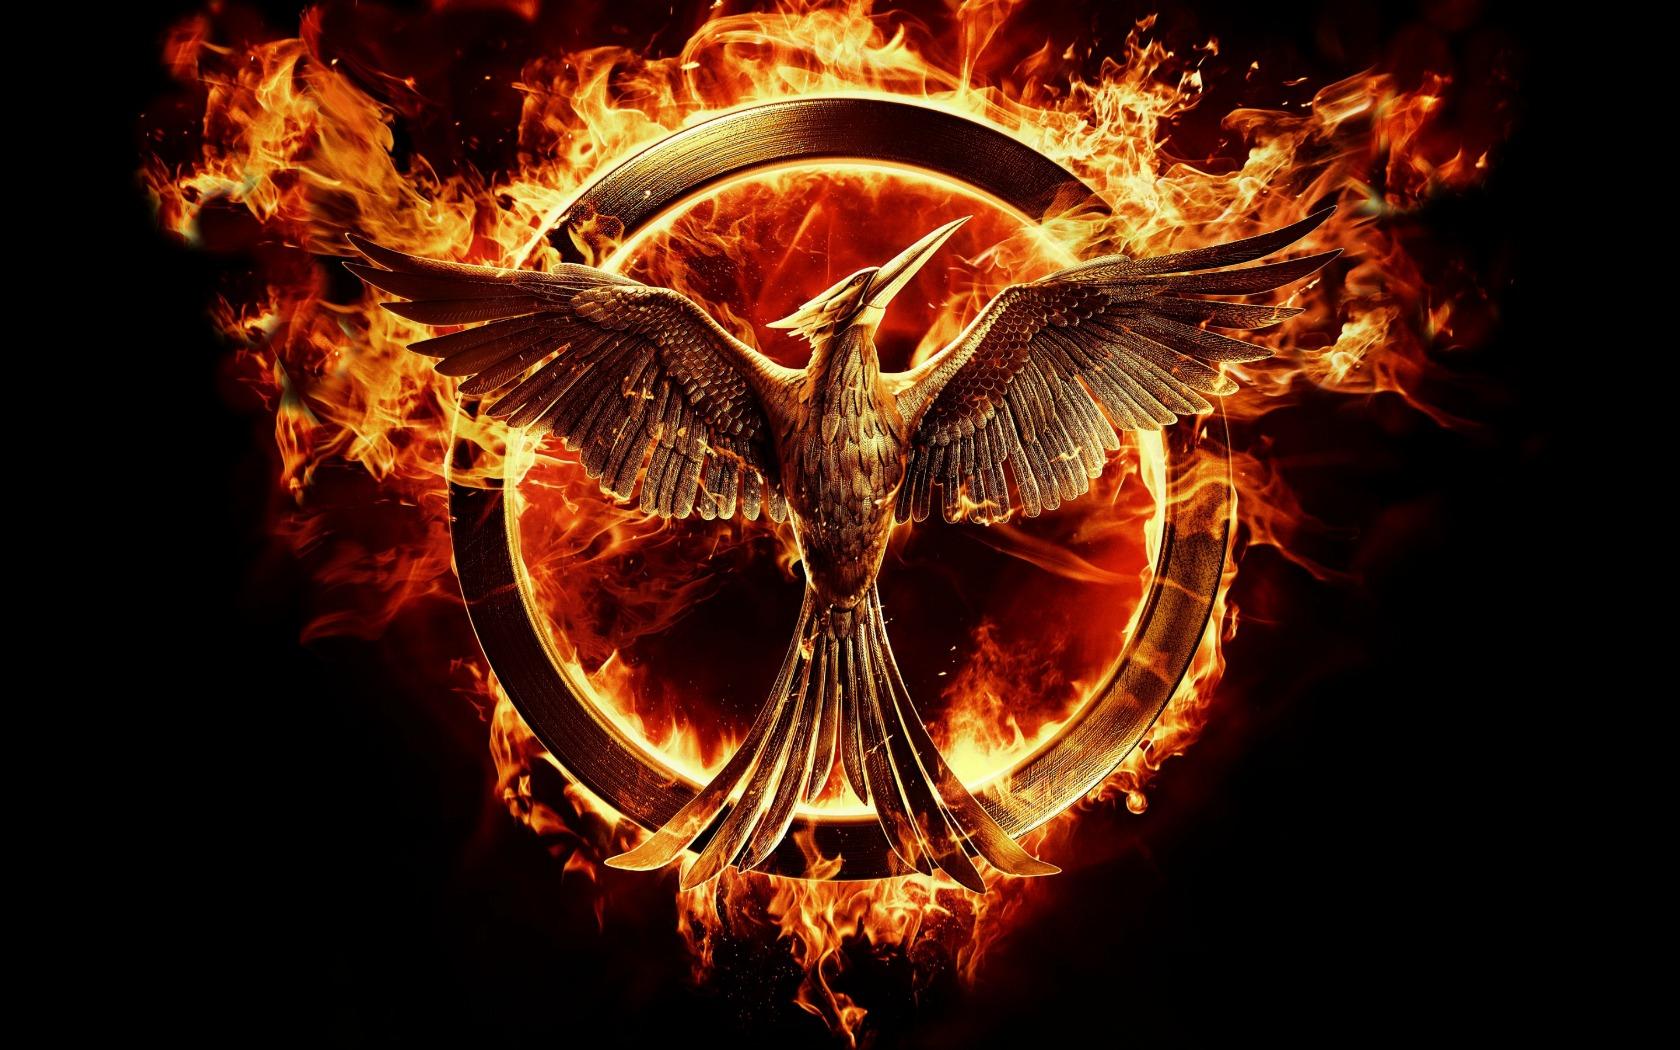 Mockingjay The Hunger Games wallpaper HD 1680x1050